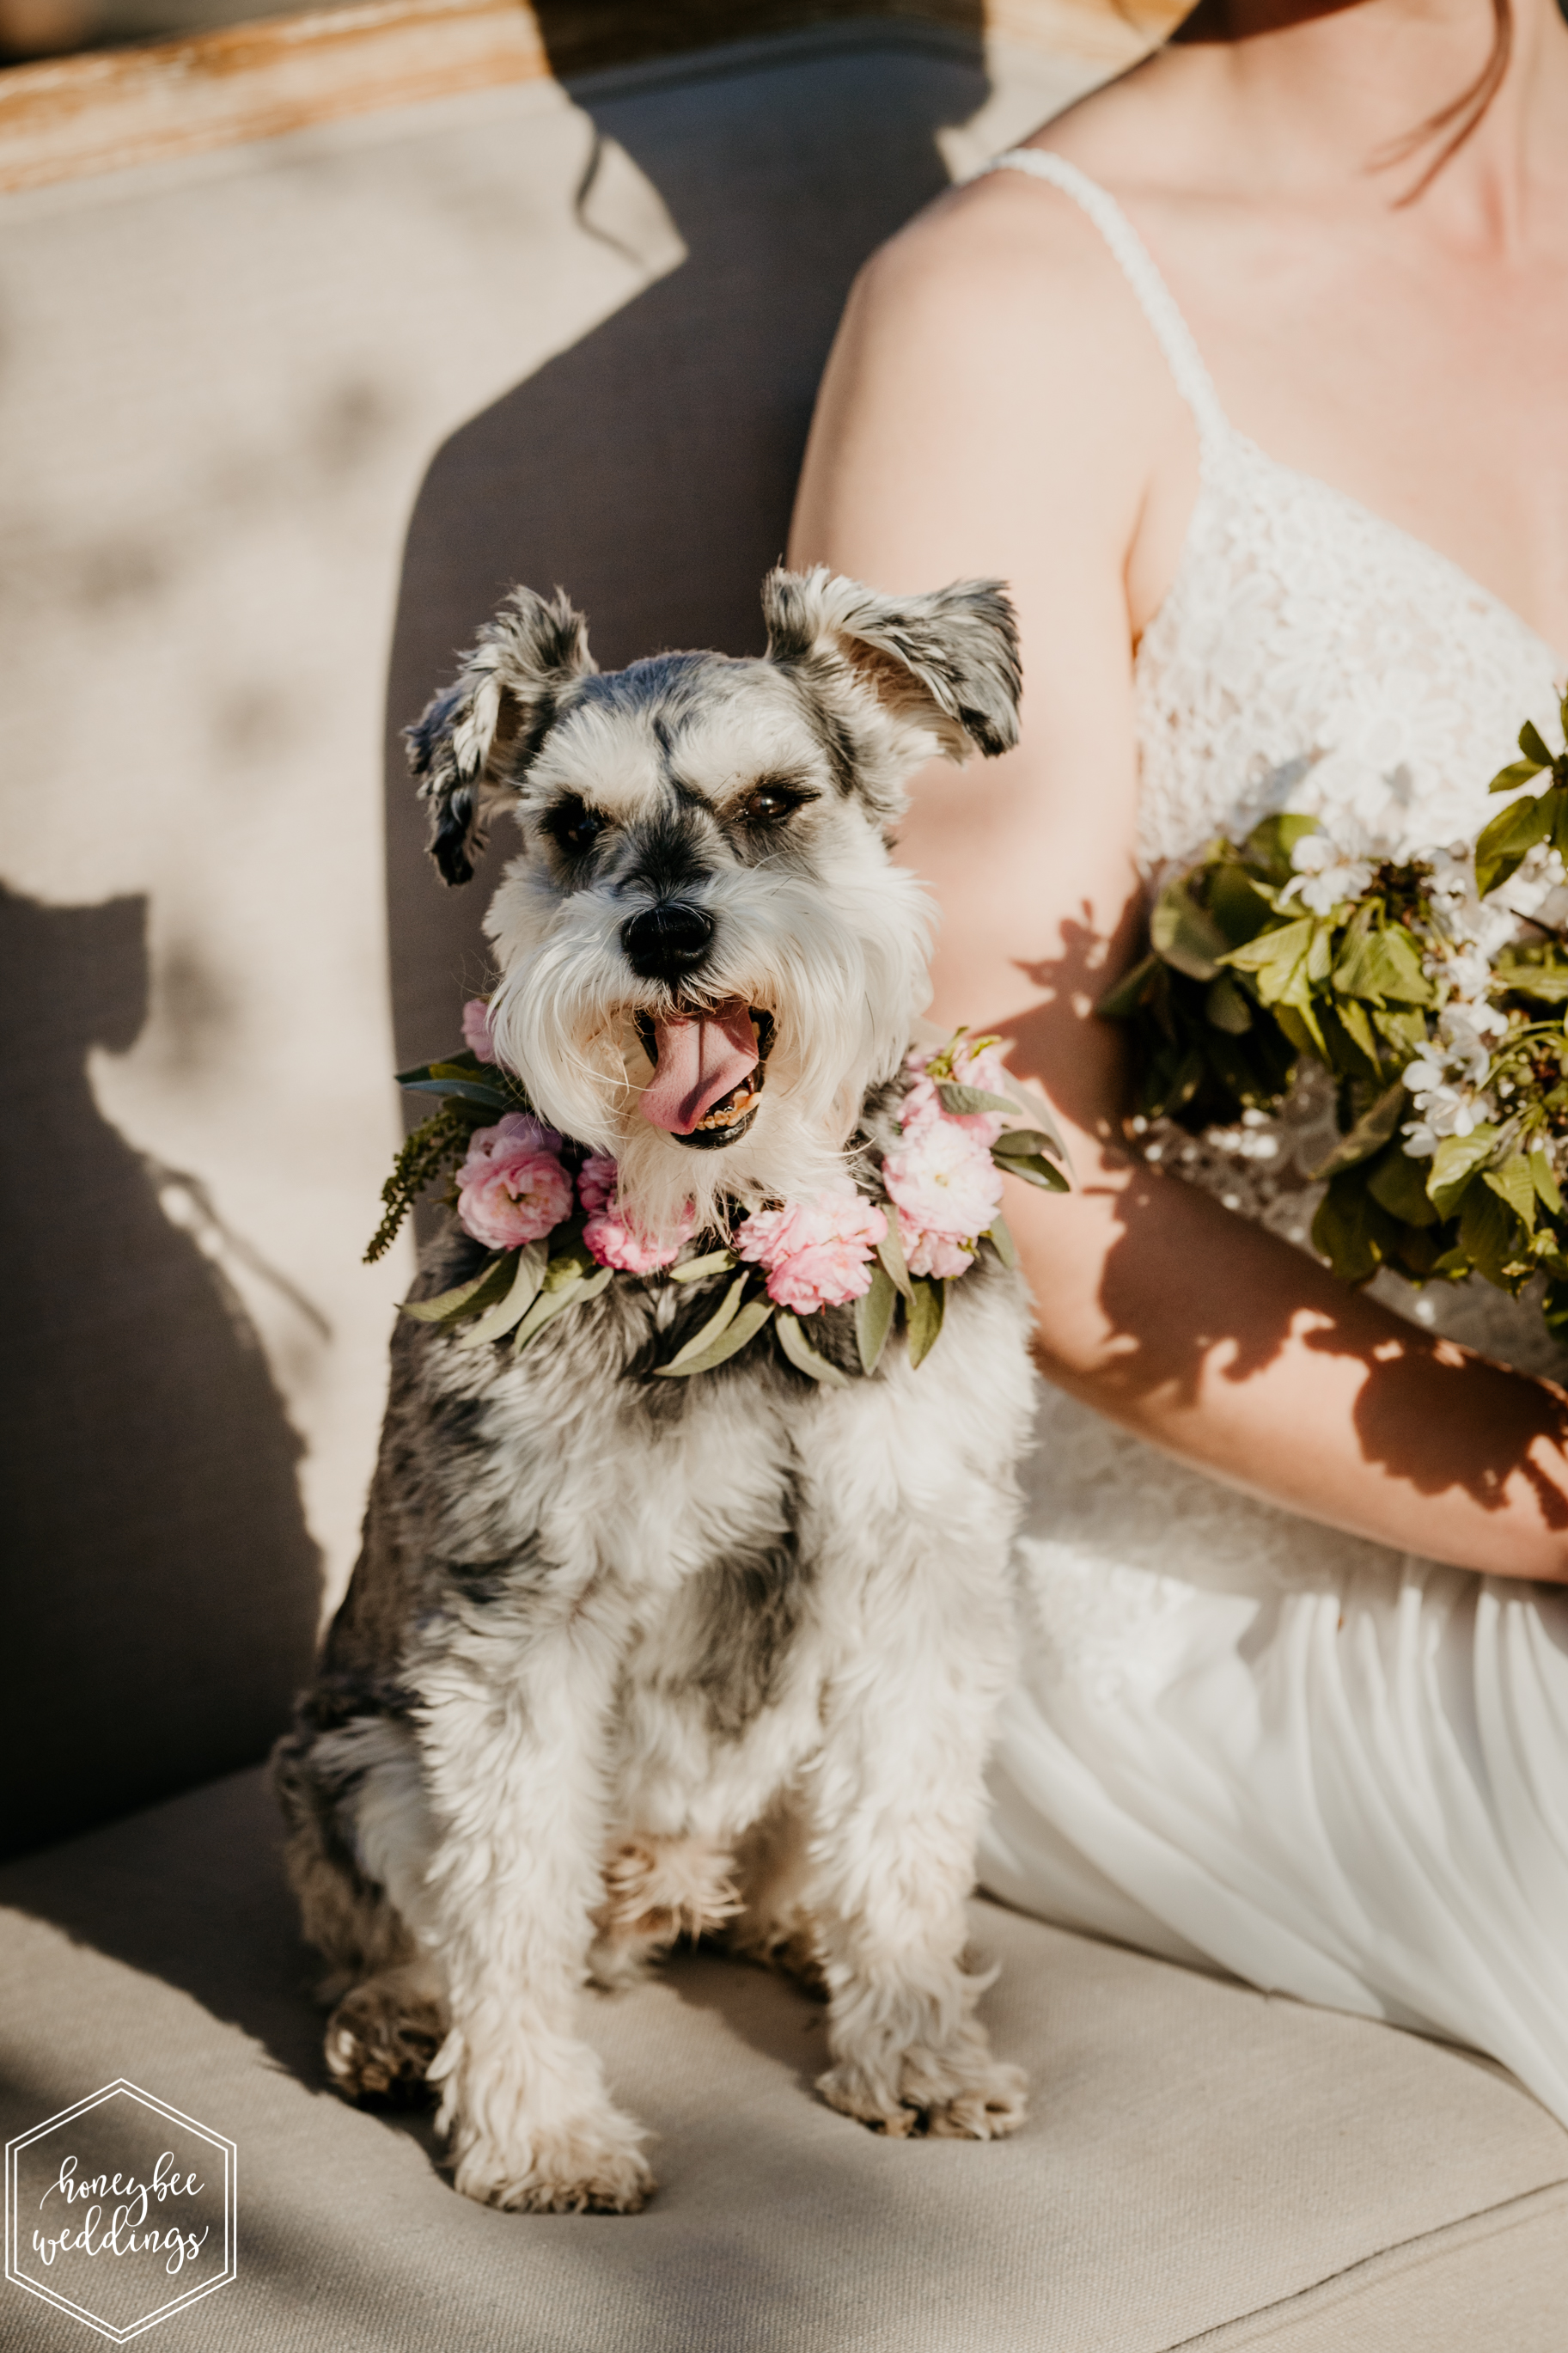 083Cherry Blossom Wedding_Styled Photoshoot_Honeybee Weddings_May 11, 2019-541.jpg